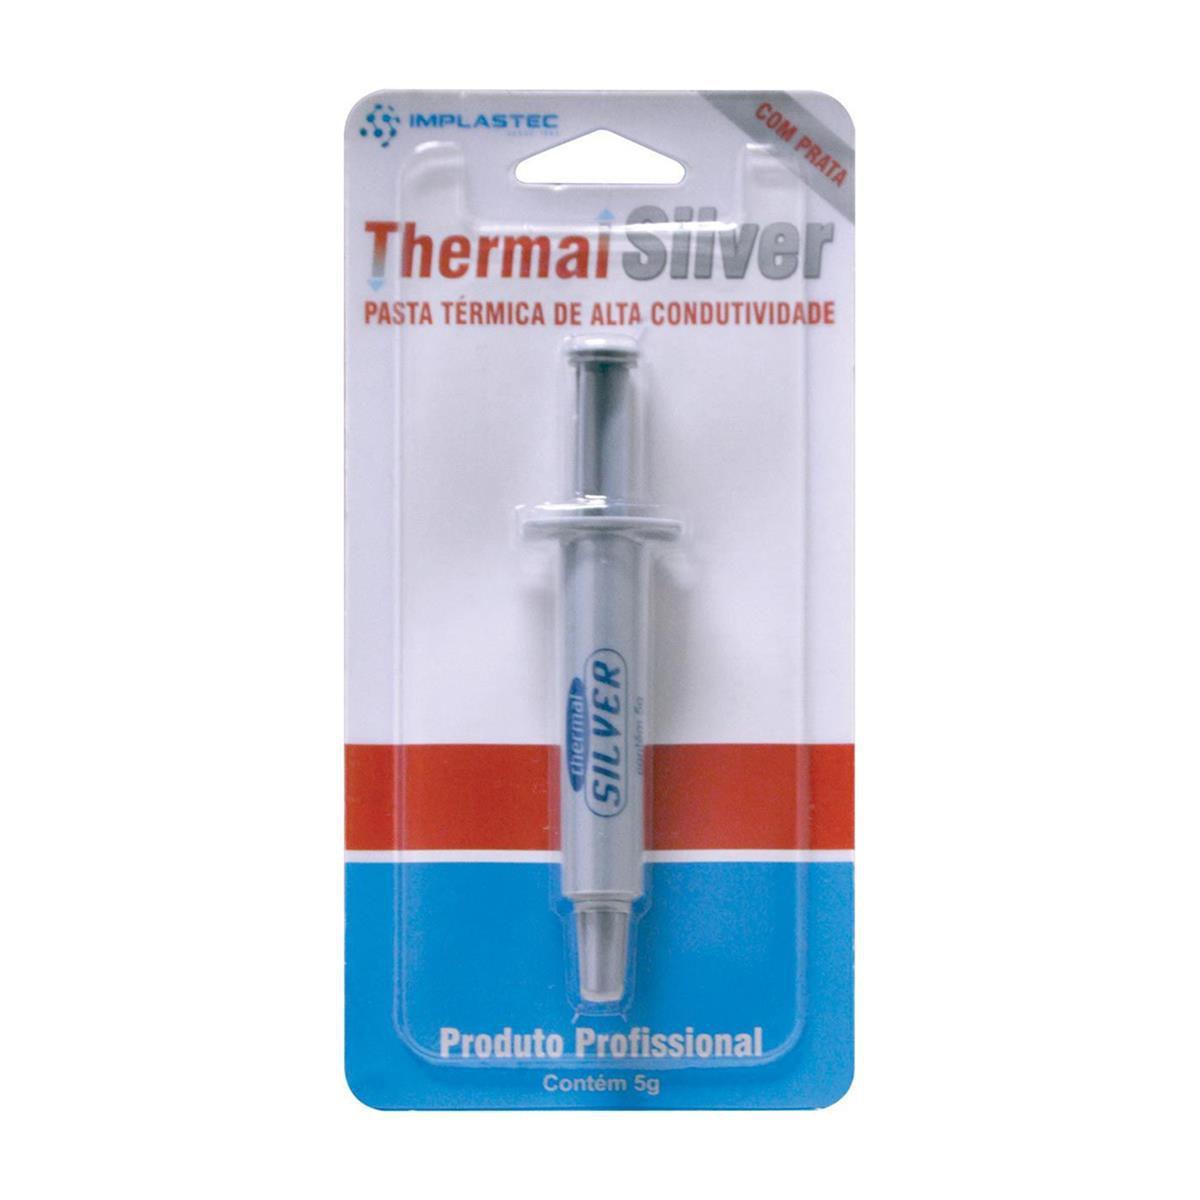 PASTA TERMICA GV THERMAL SILVER 5G BLISTER-Garantia: 90 dias